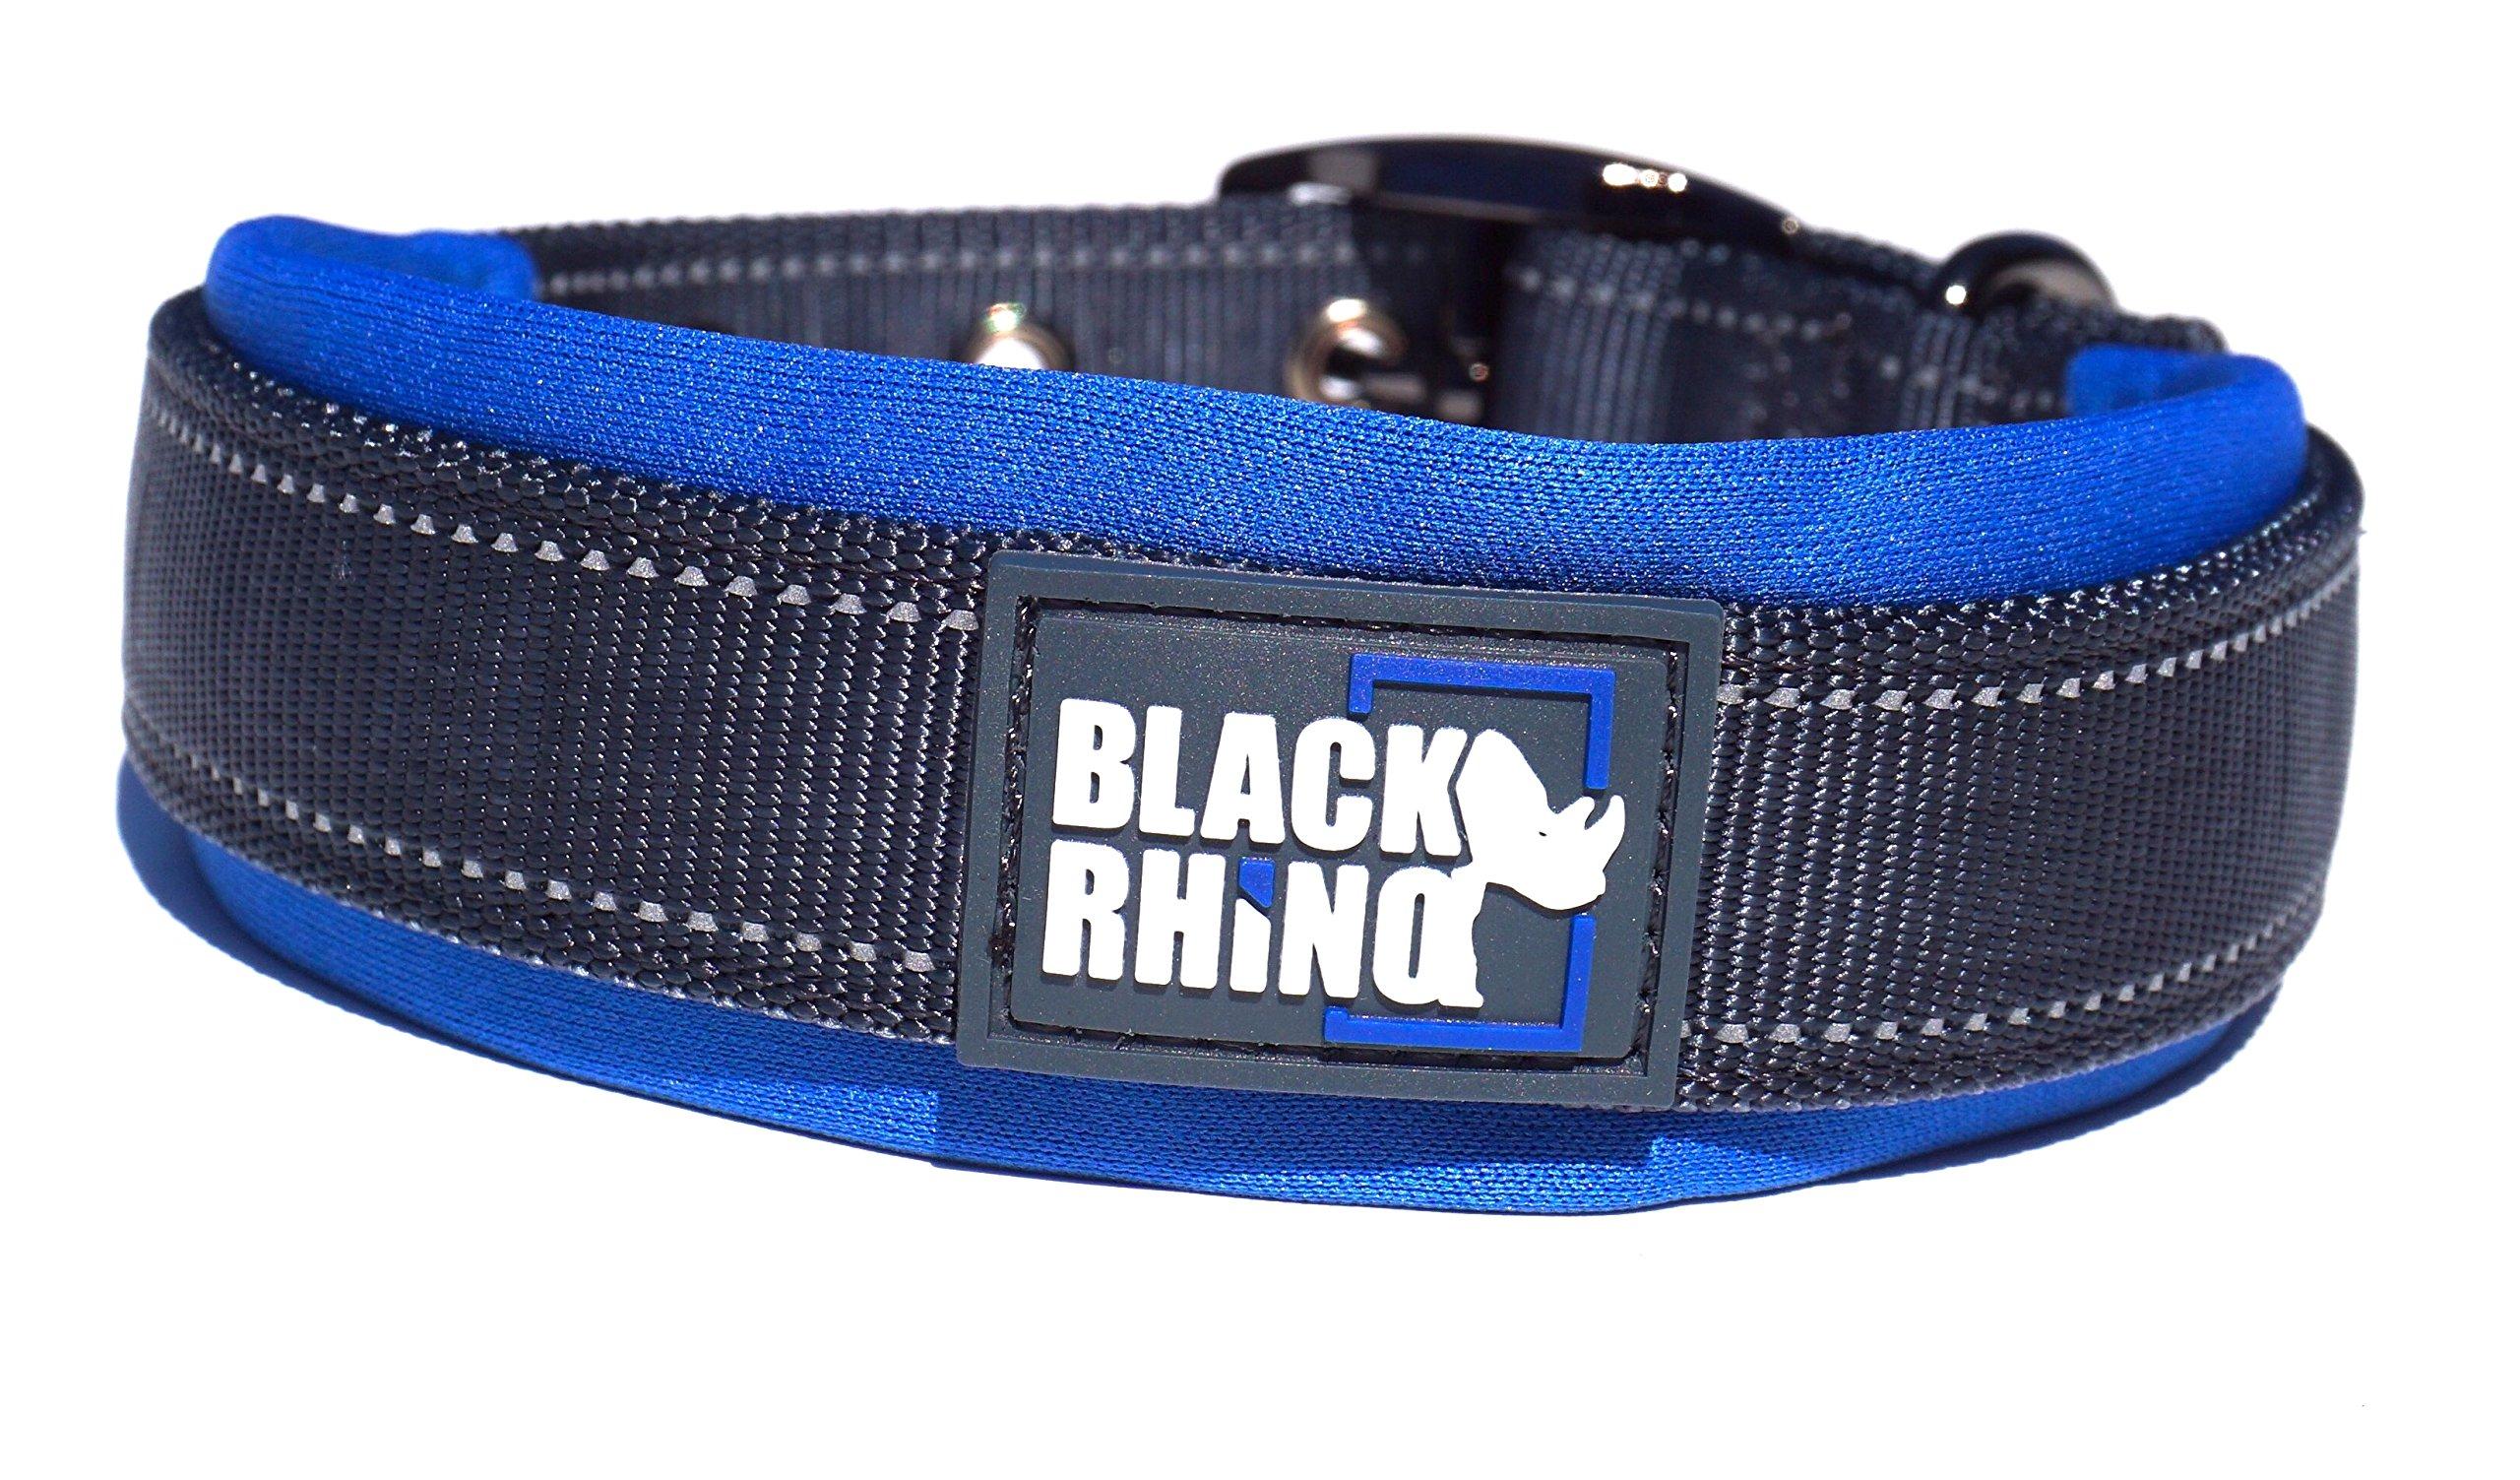 Black Rhino - The Comfort Collar Ultra Soft Neoprene Padded Dog Collar All Breeds - Heavy Duty Adjustable Reflective Weatherproof (Large, Blue/Grey)